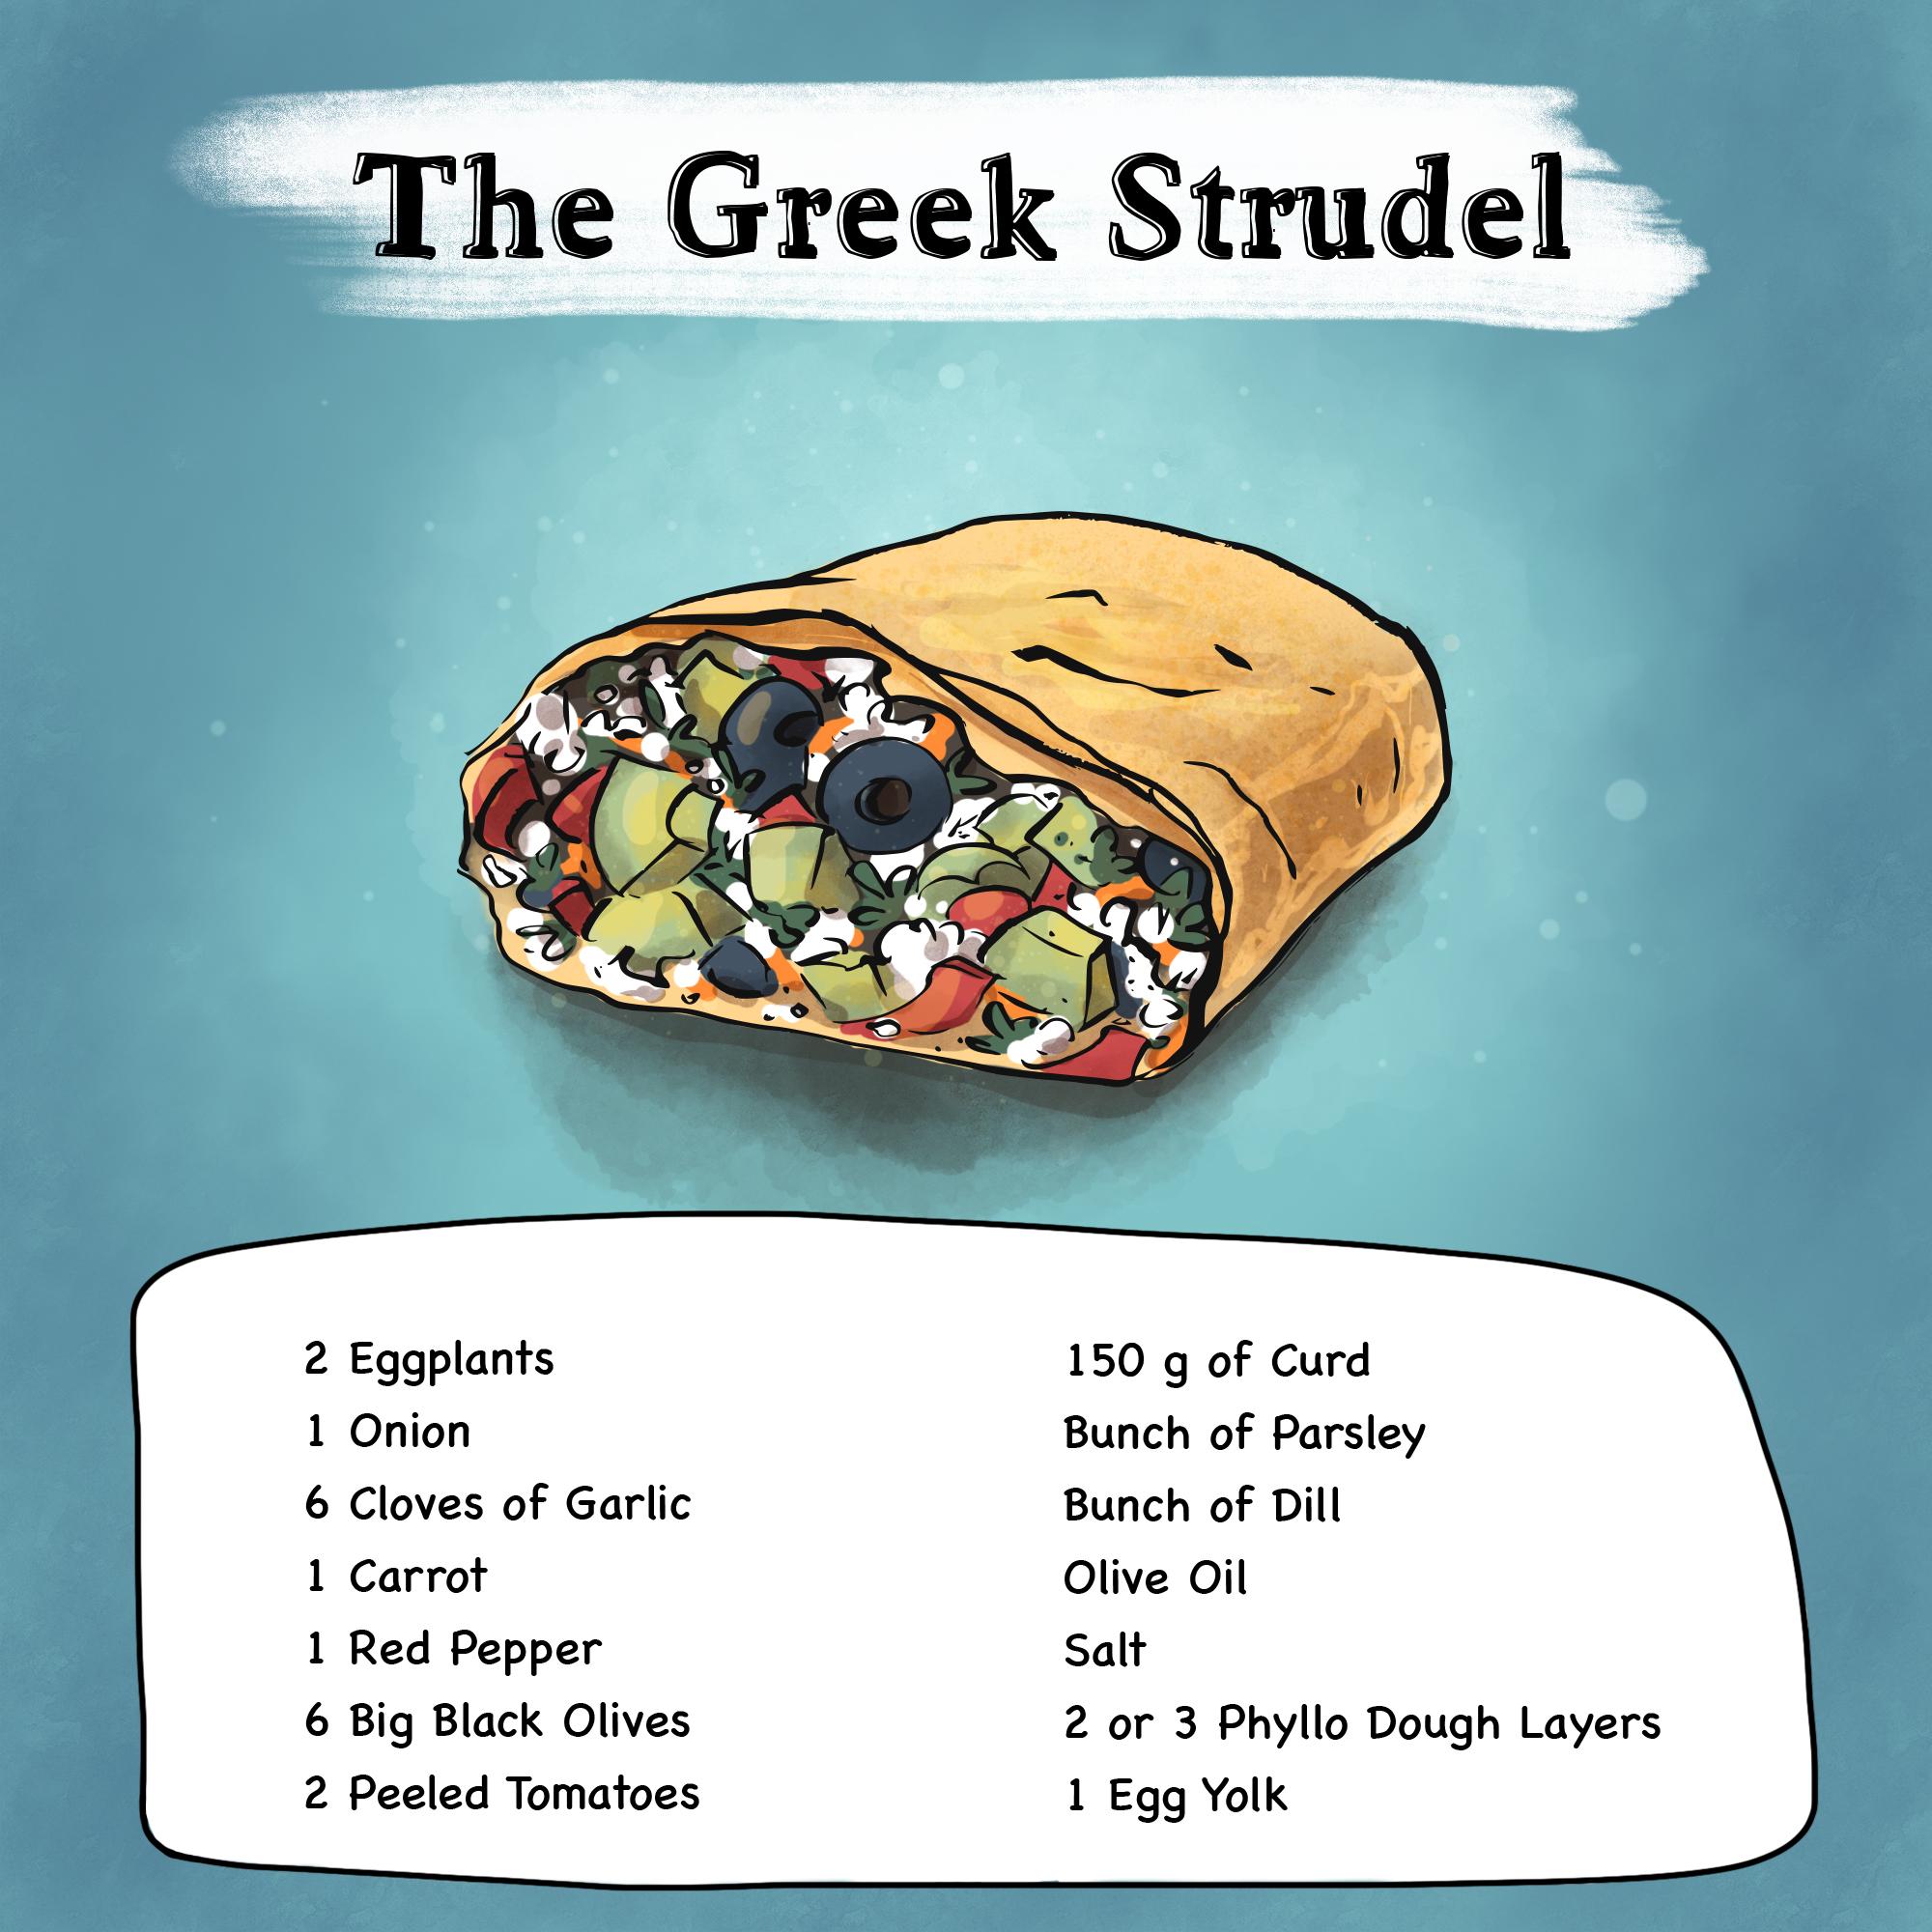 The Greek Strudel